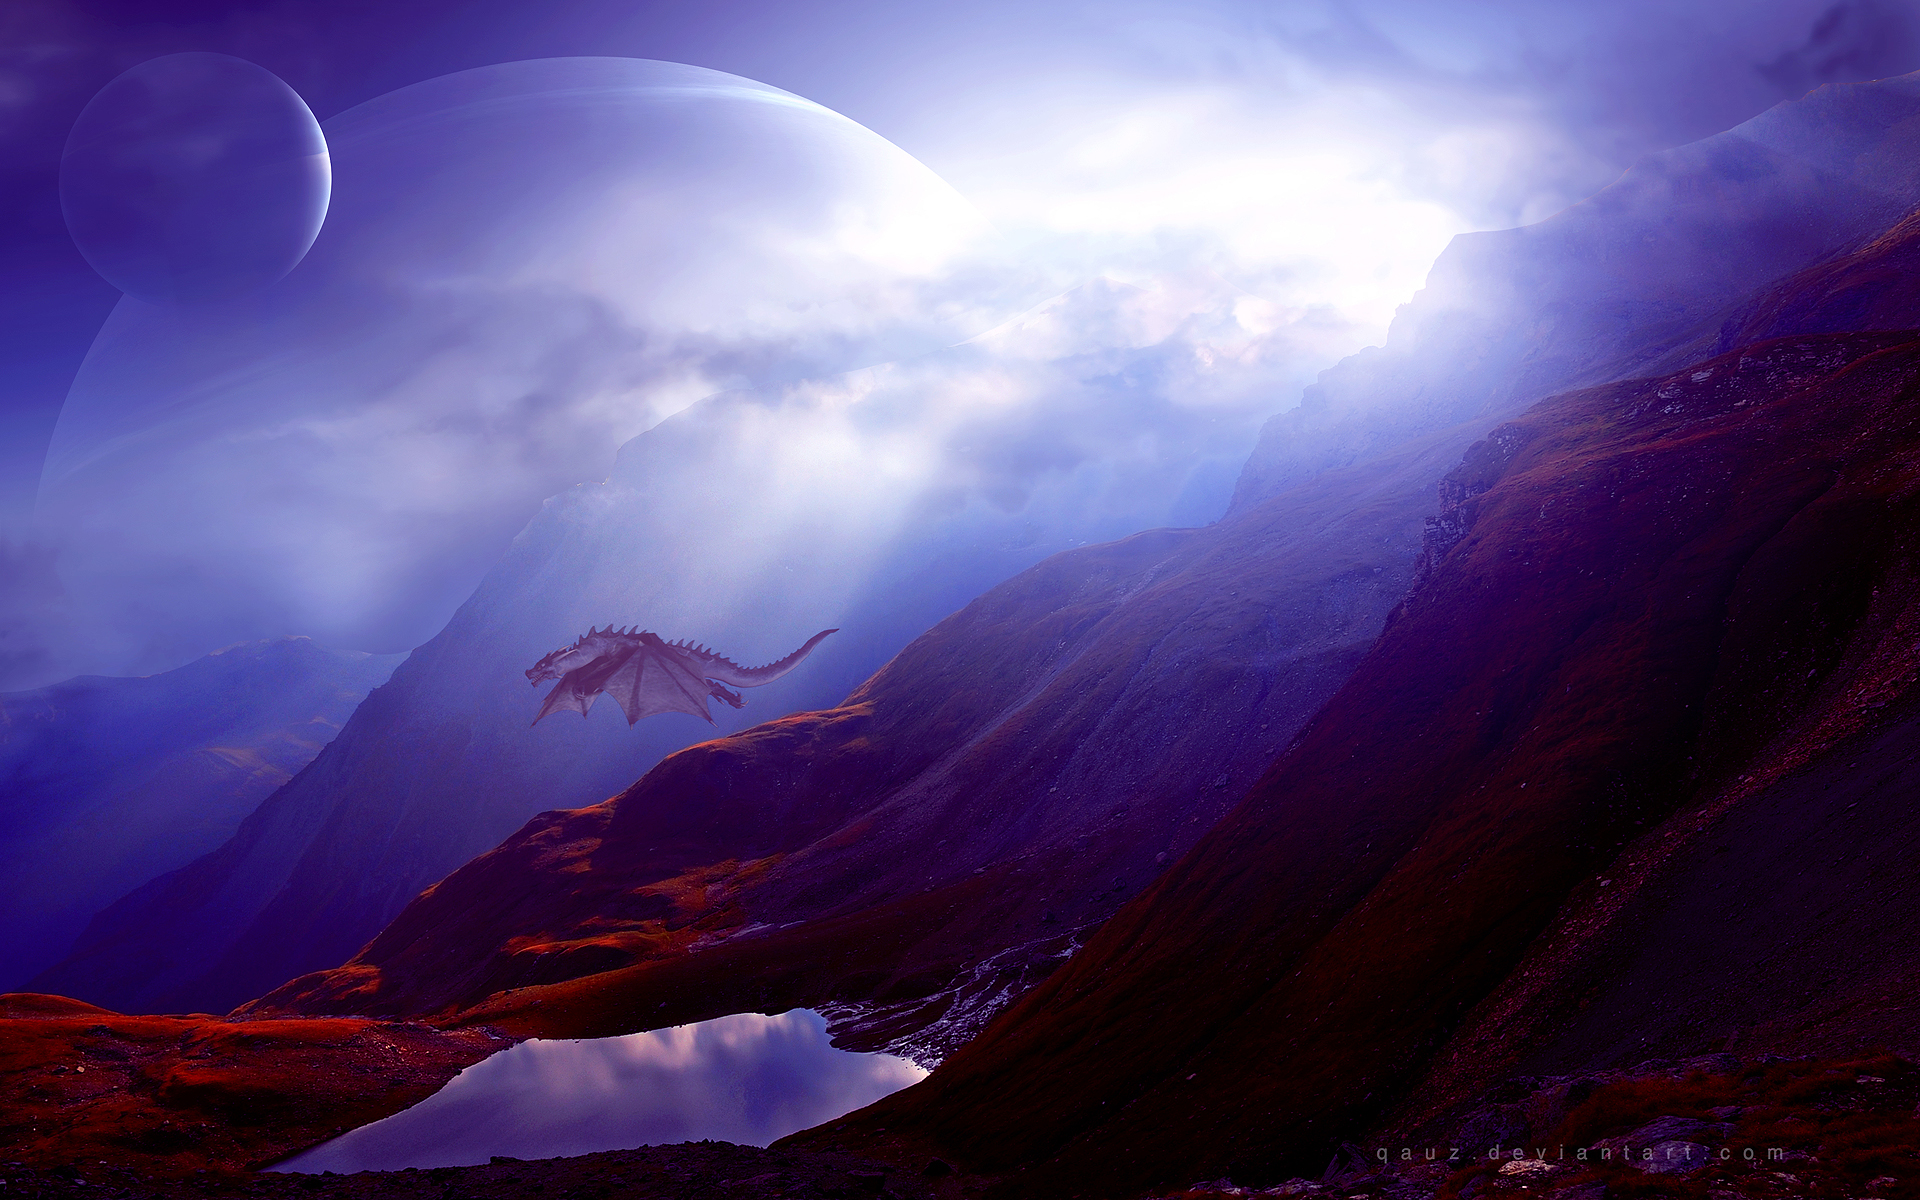 HD Wallpapers Dragon Mountains